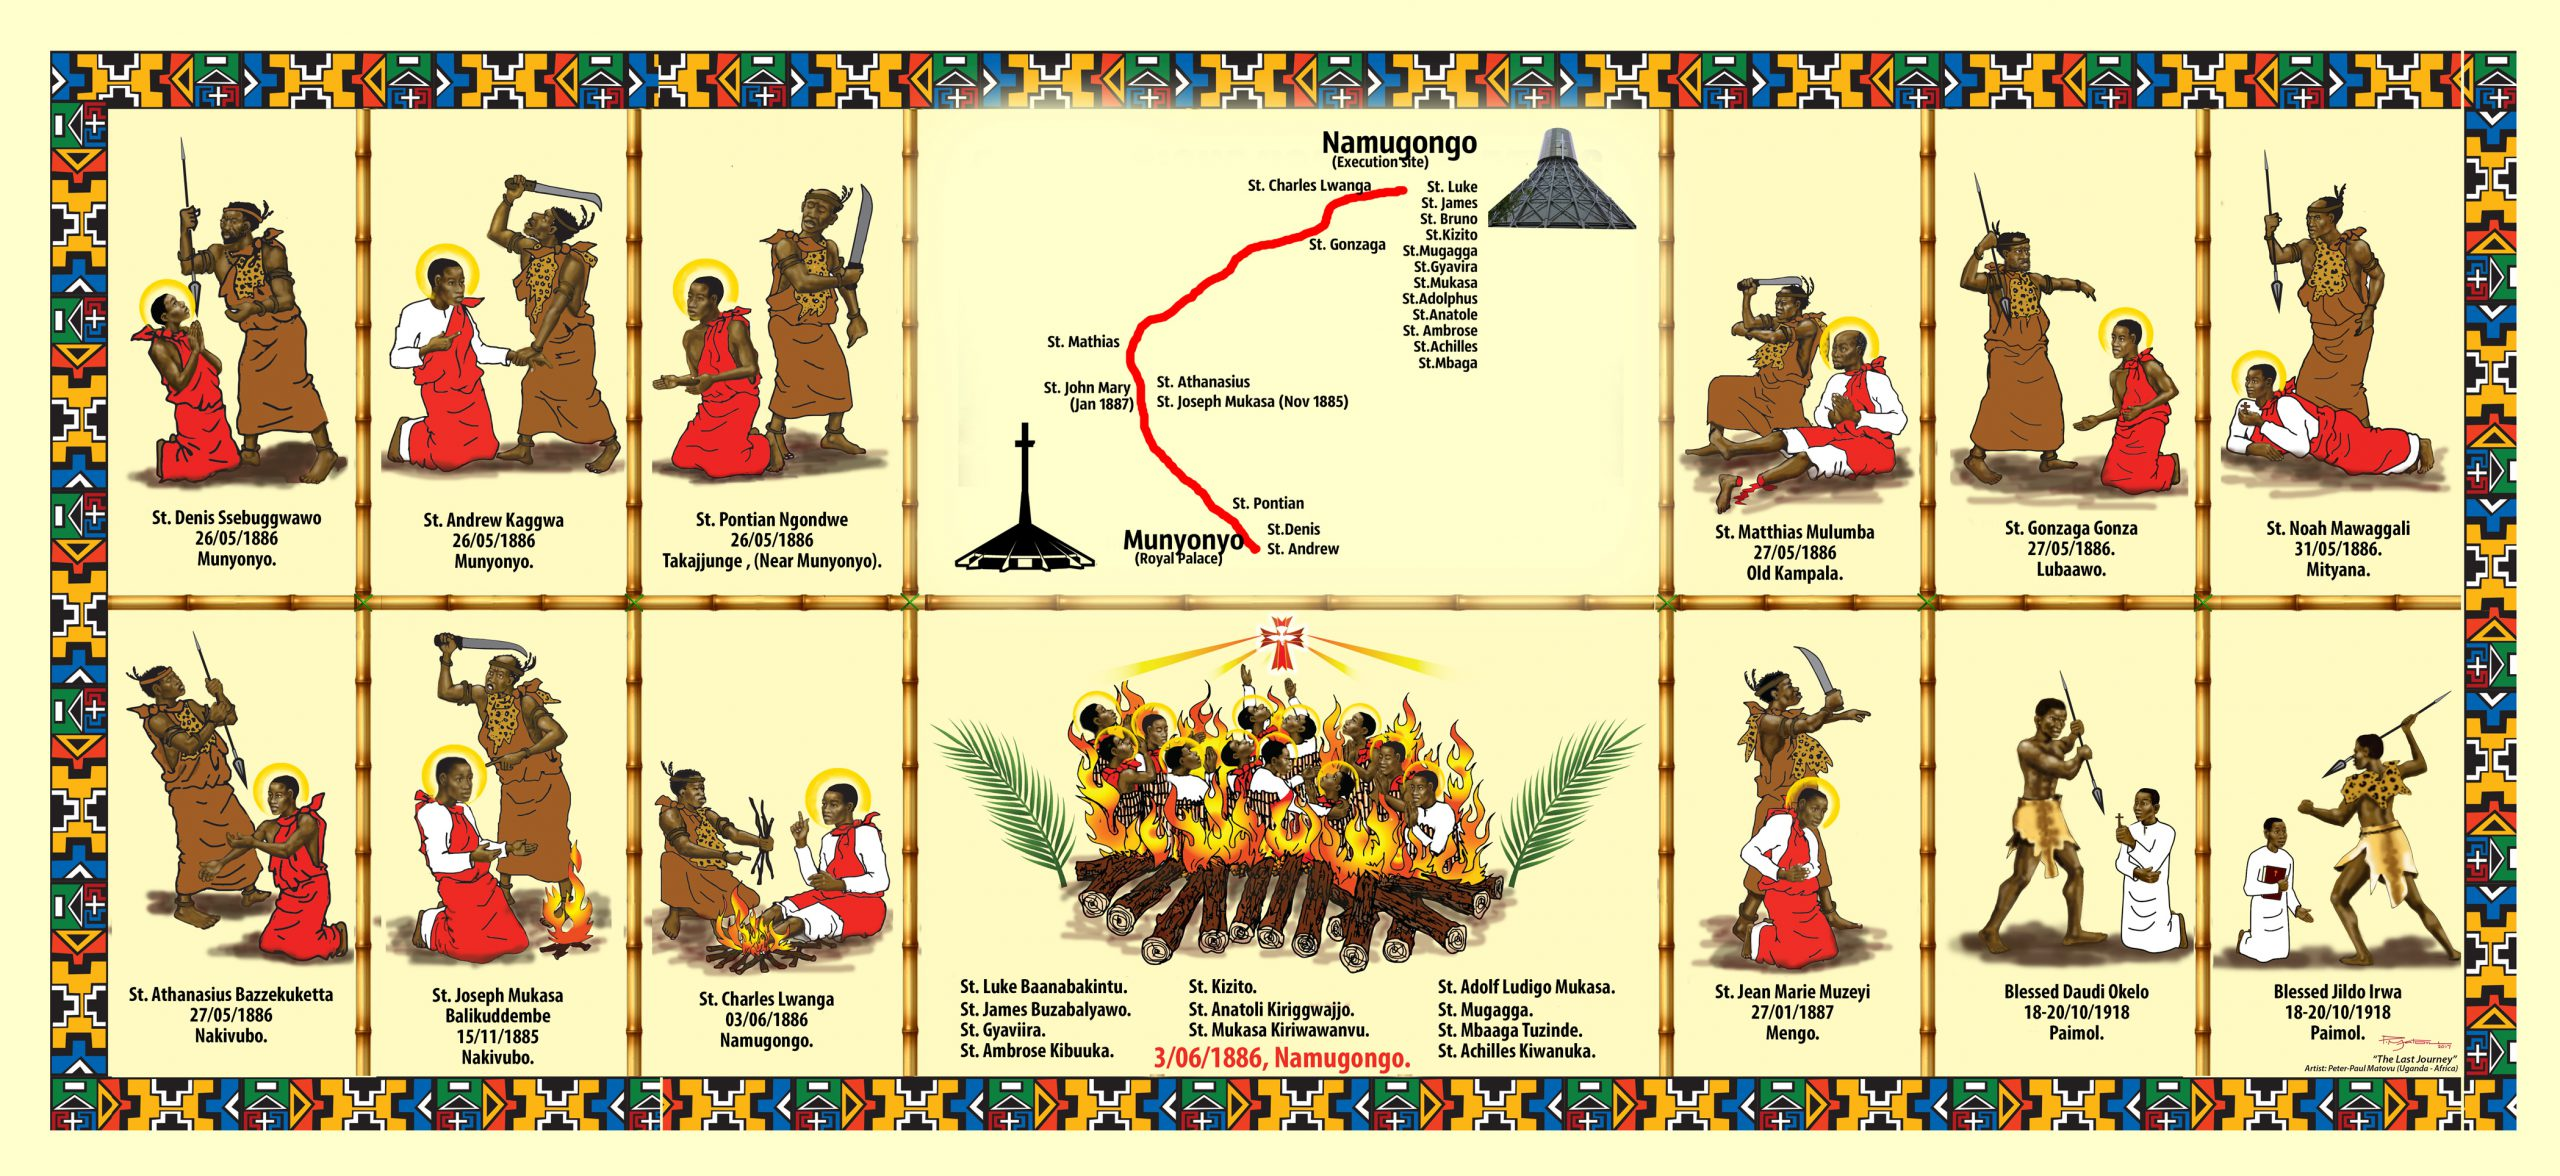 The Holy Uganda Martyrs